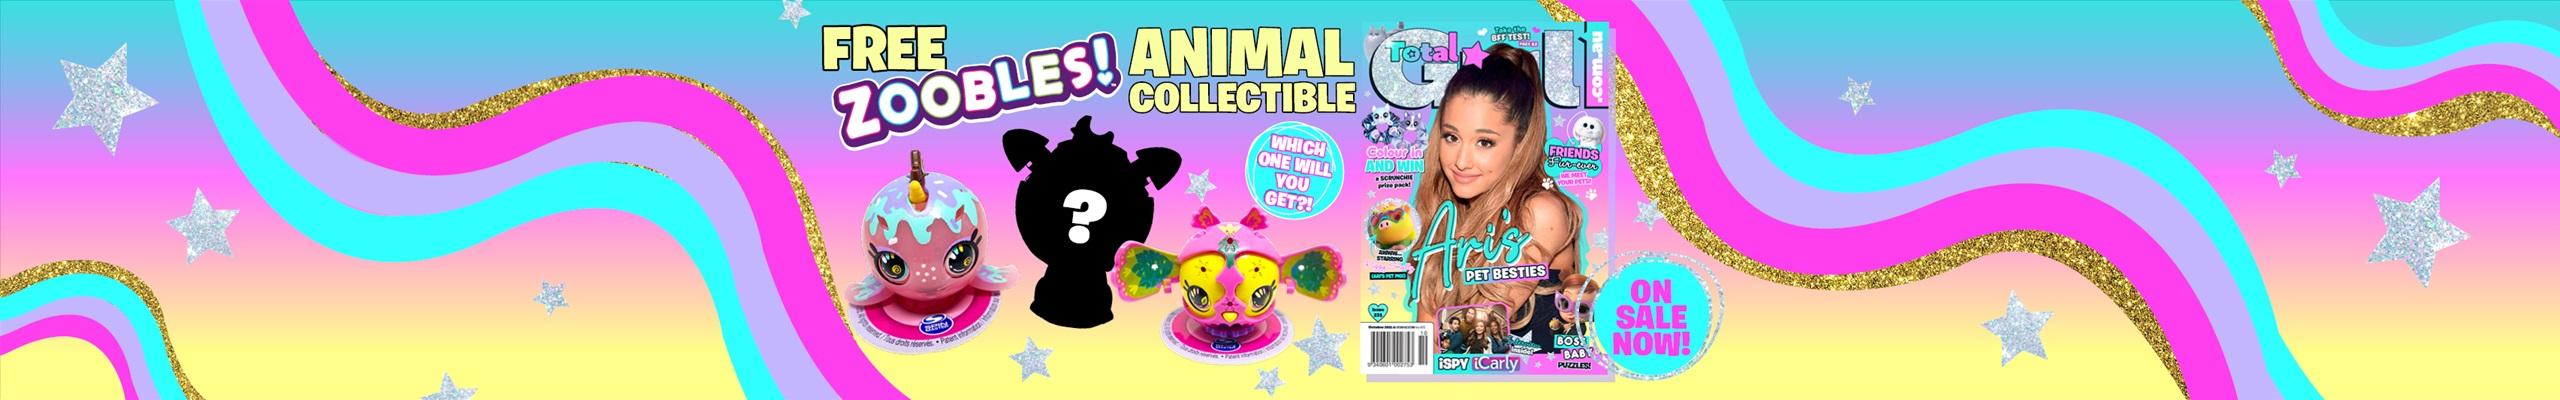 Sneak Peek of the October issue!   2021